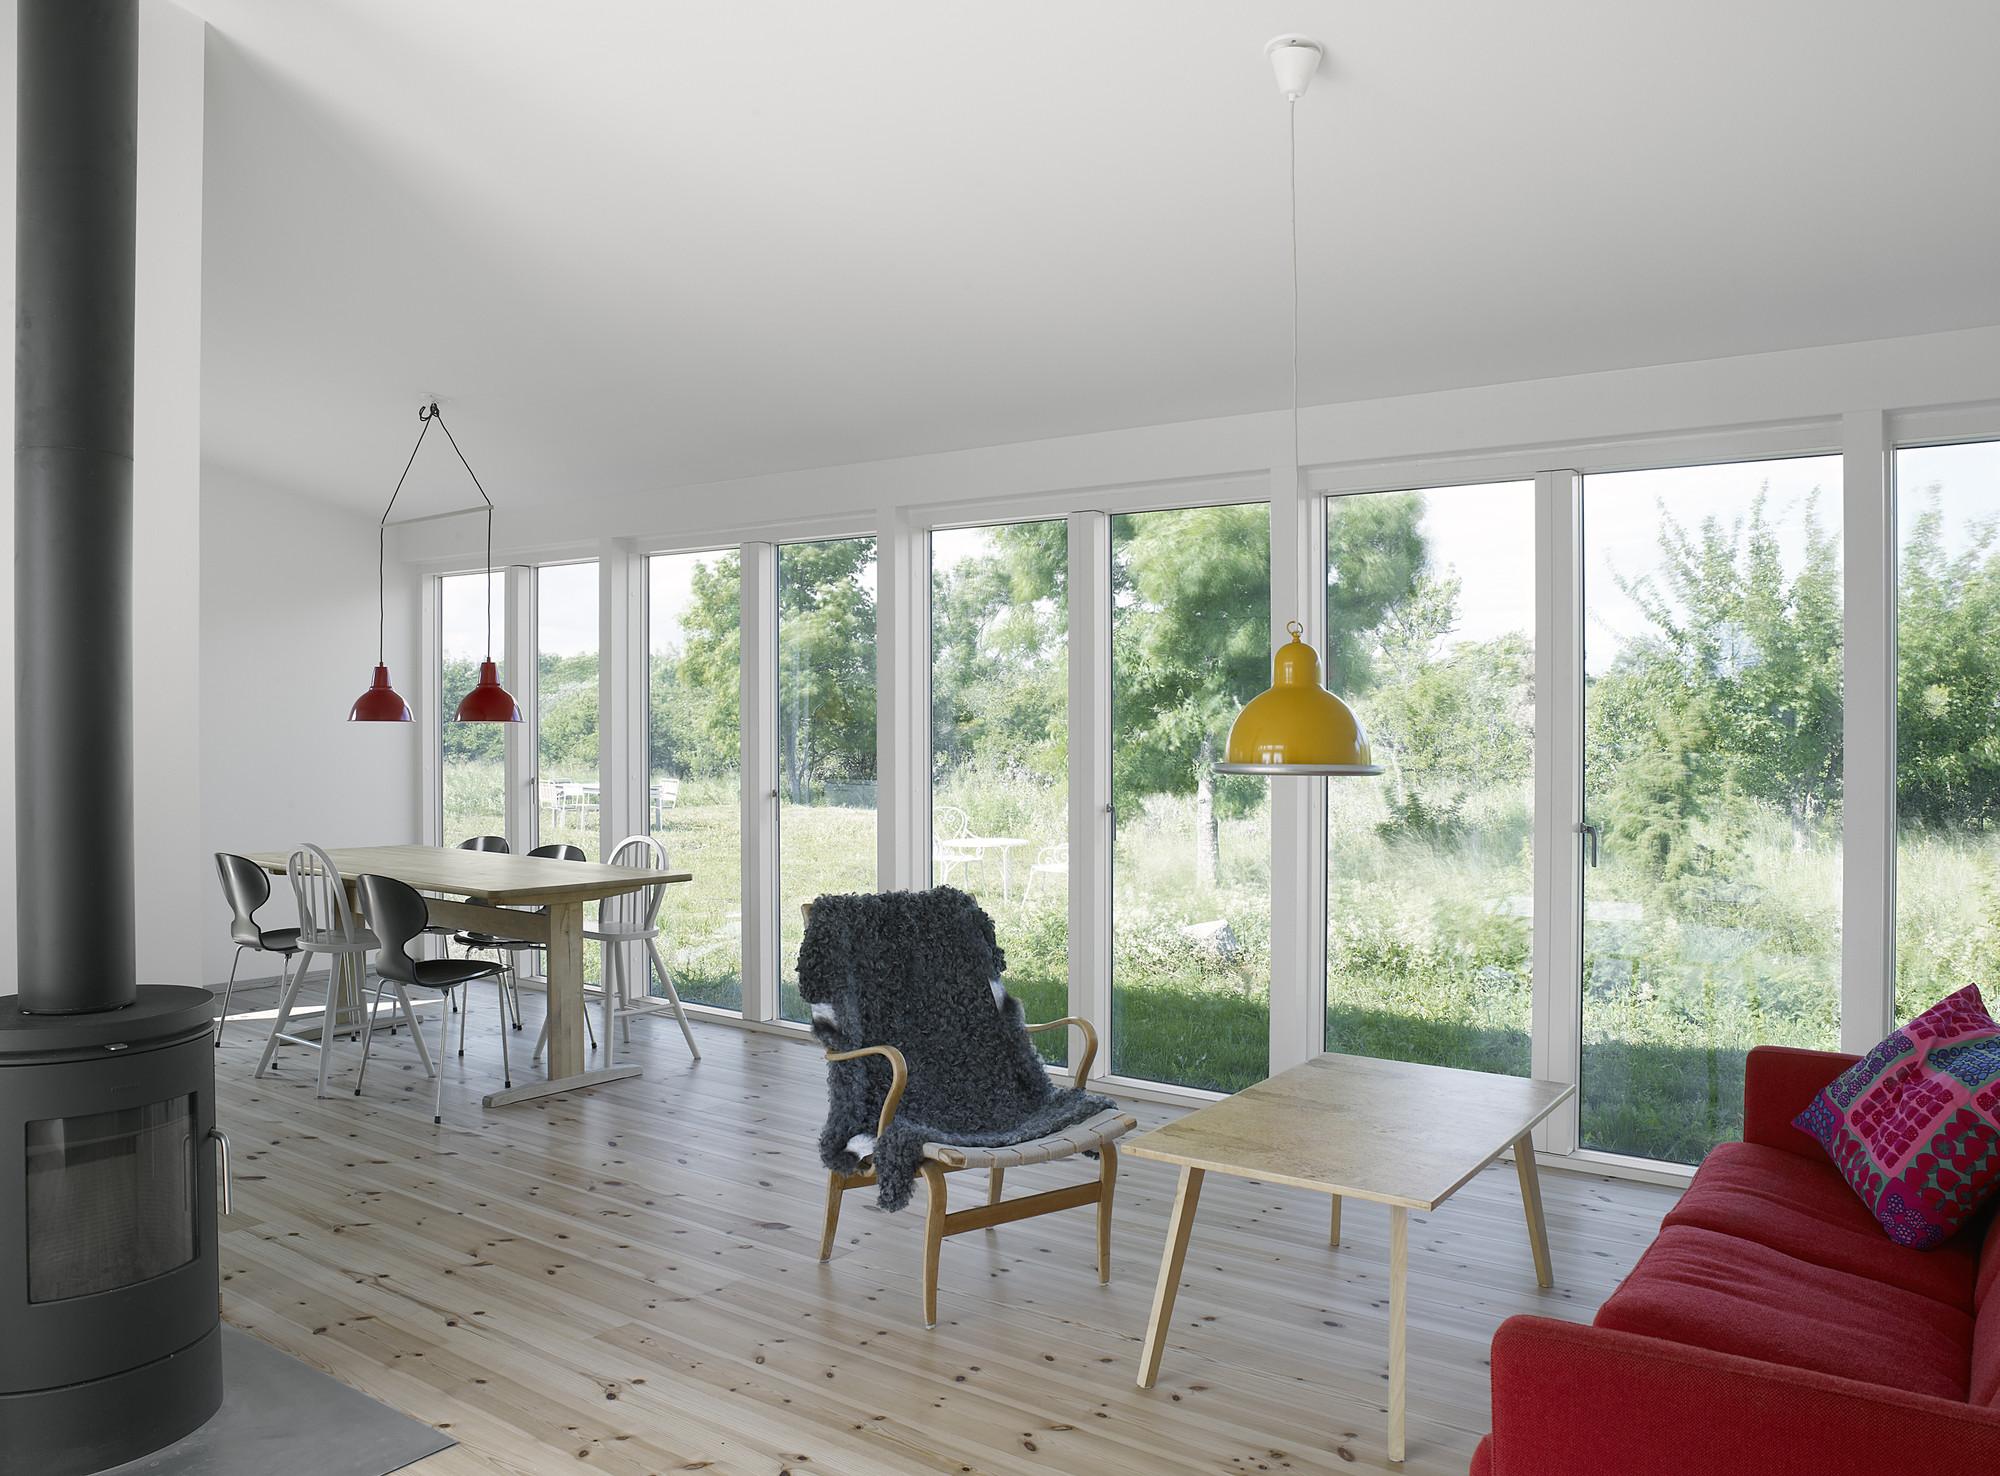 Gallery of Gammelgarn Mattsarve / LLP Arkitektkontor - 5